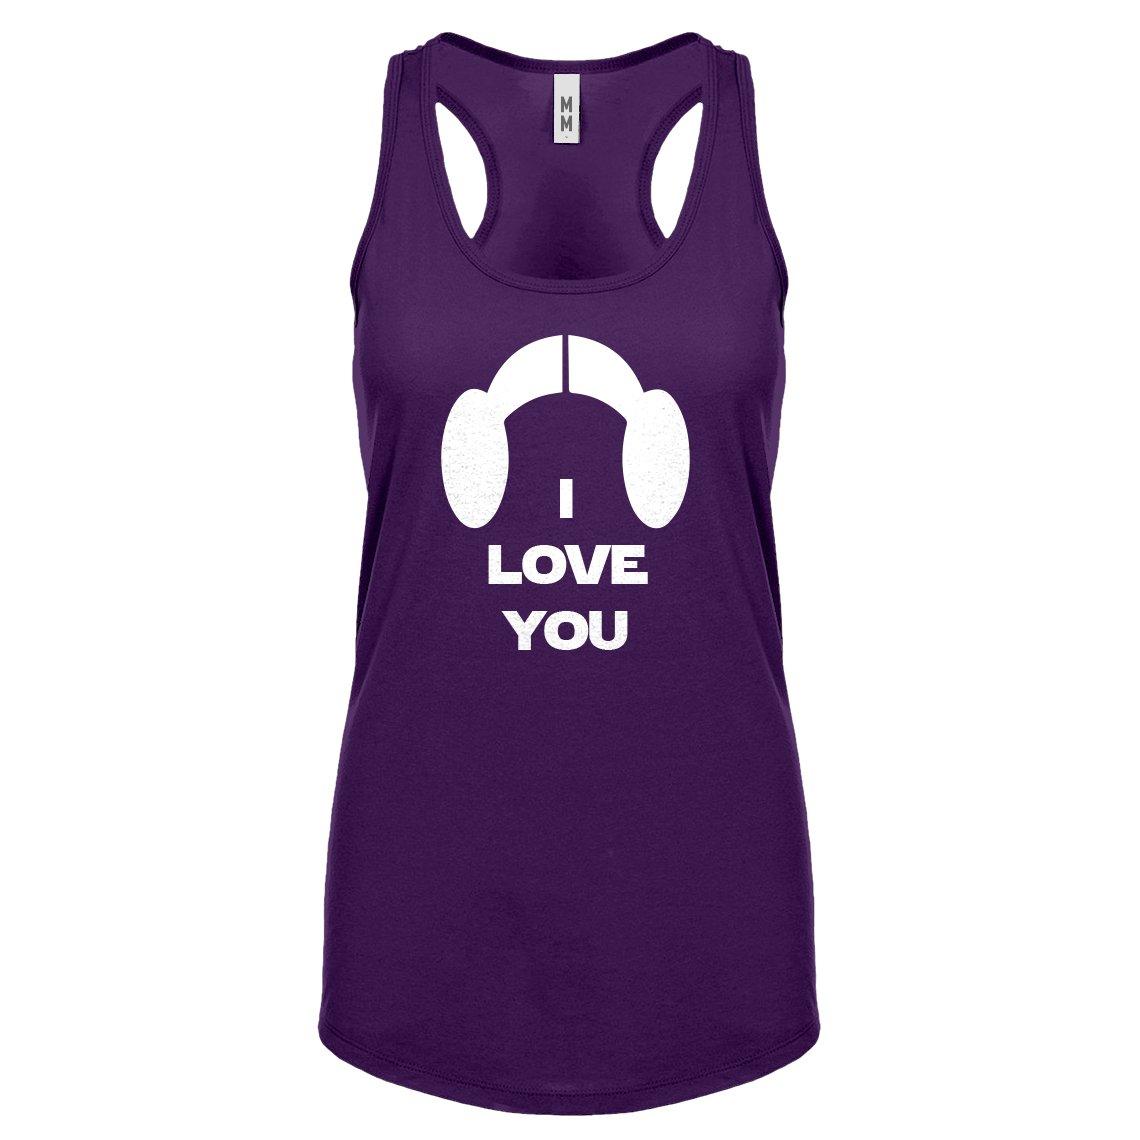 Indica Plateau Womens I Love You Racerback Tank Top